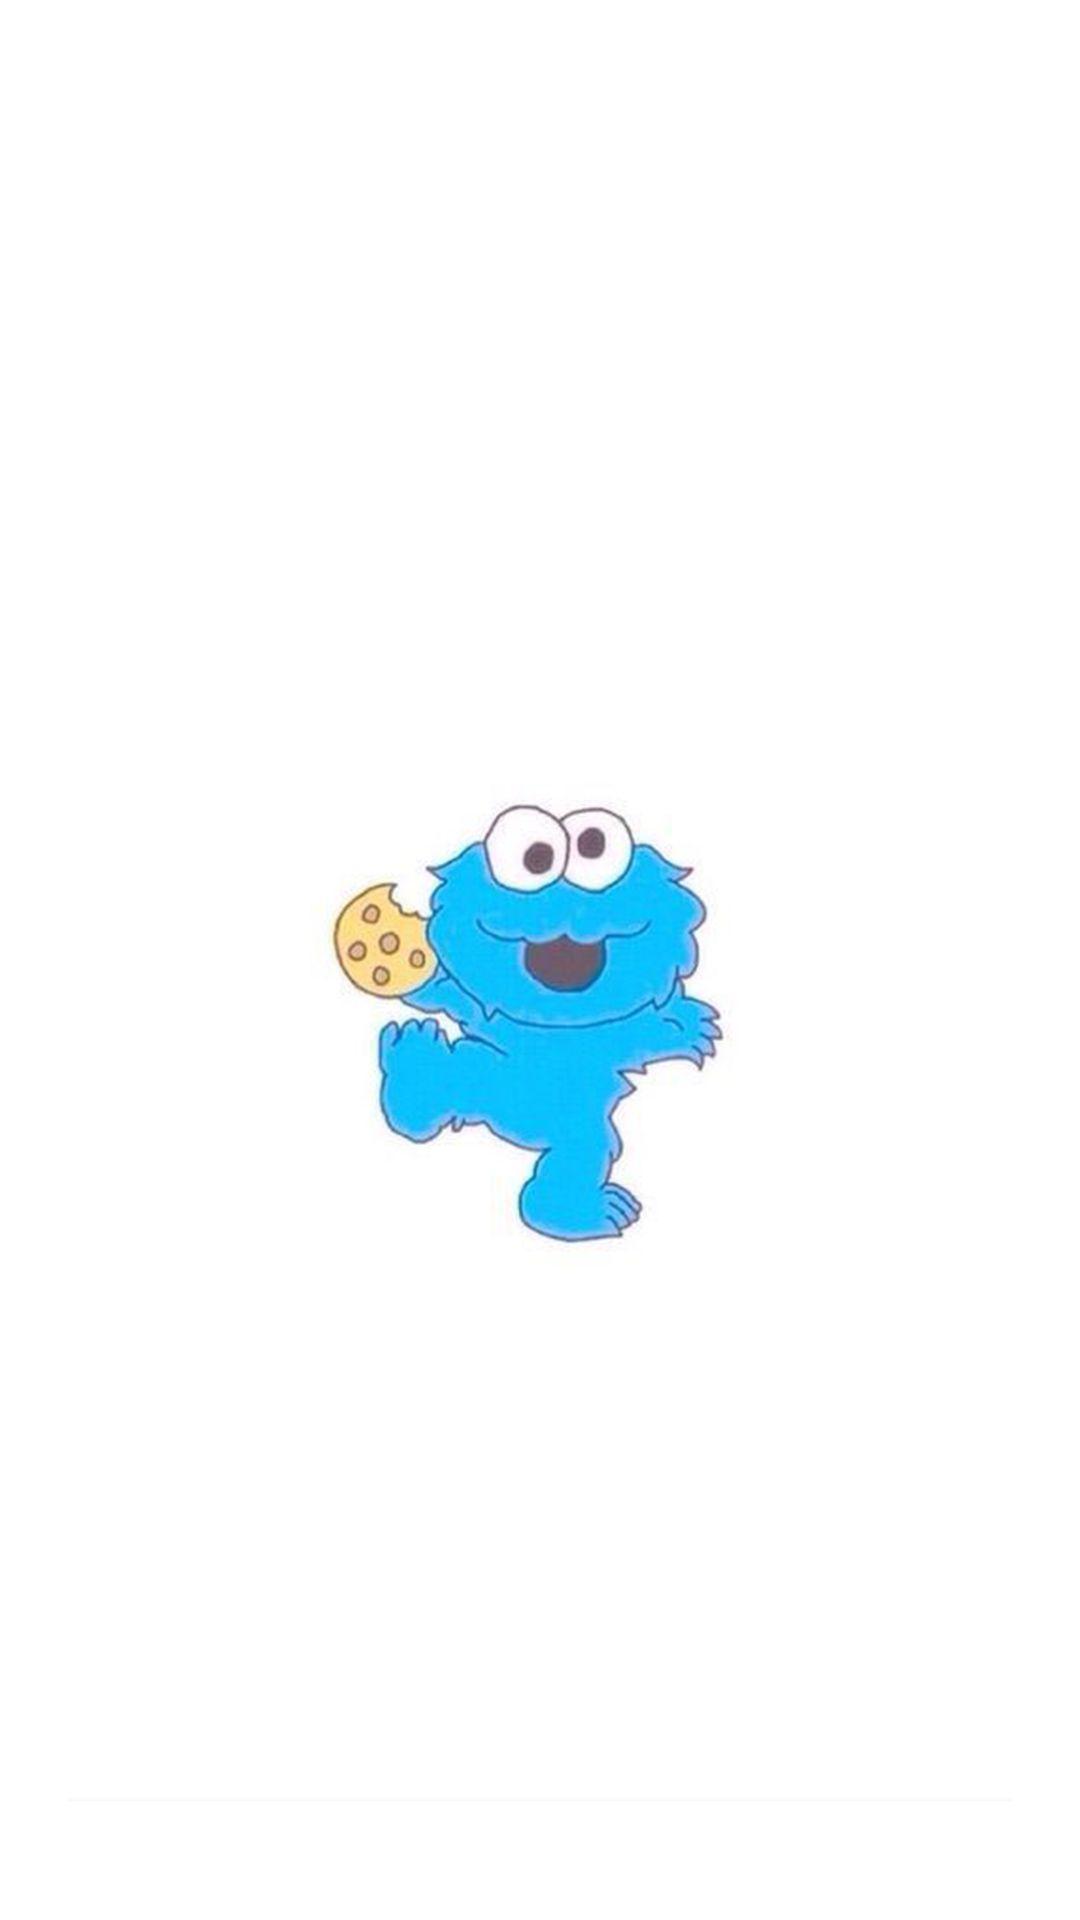 Baby Cookie Monster Iphone 6 Hd Wallpaper Cookie Monster Wallpaper Disney Phone Wallpaper Wallpaper Iphone Love